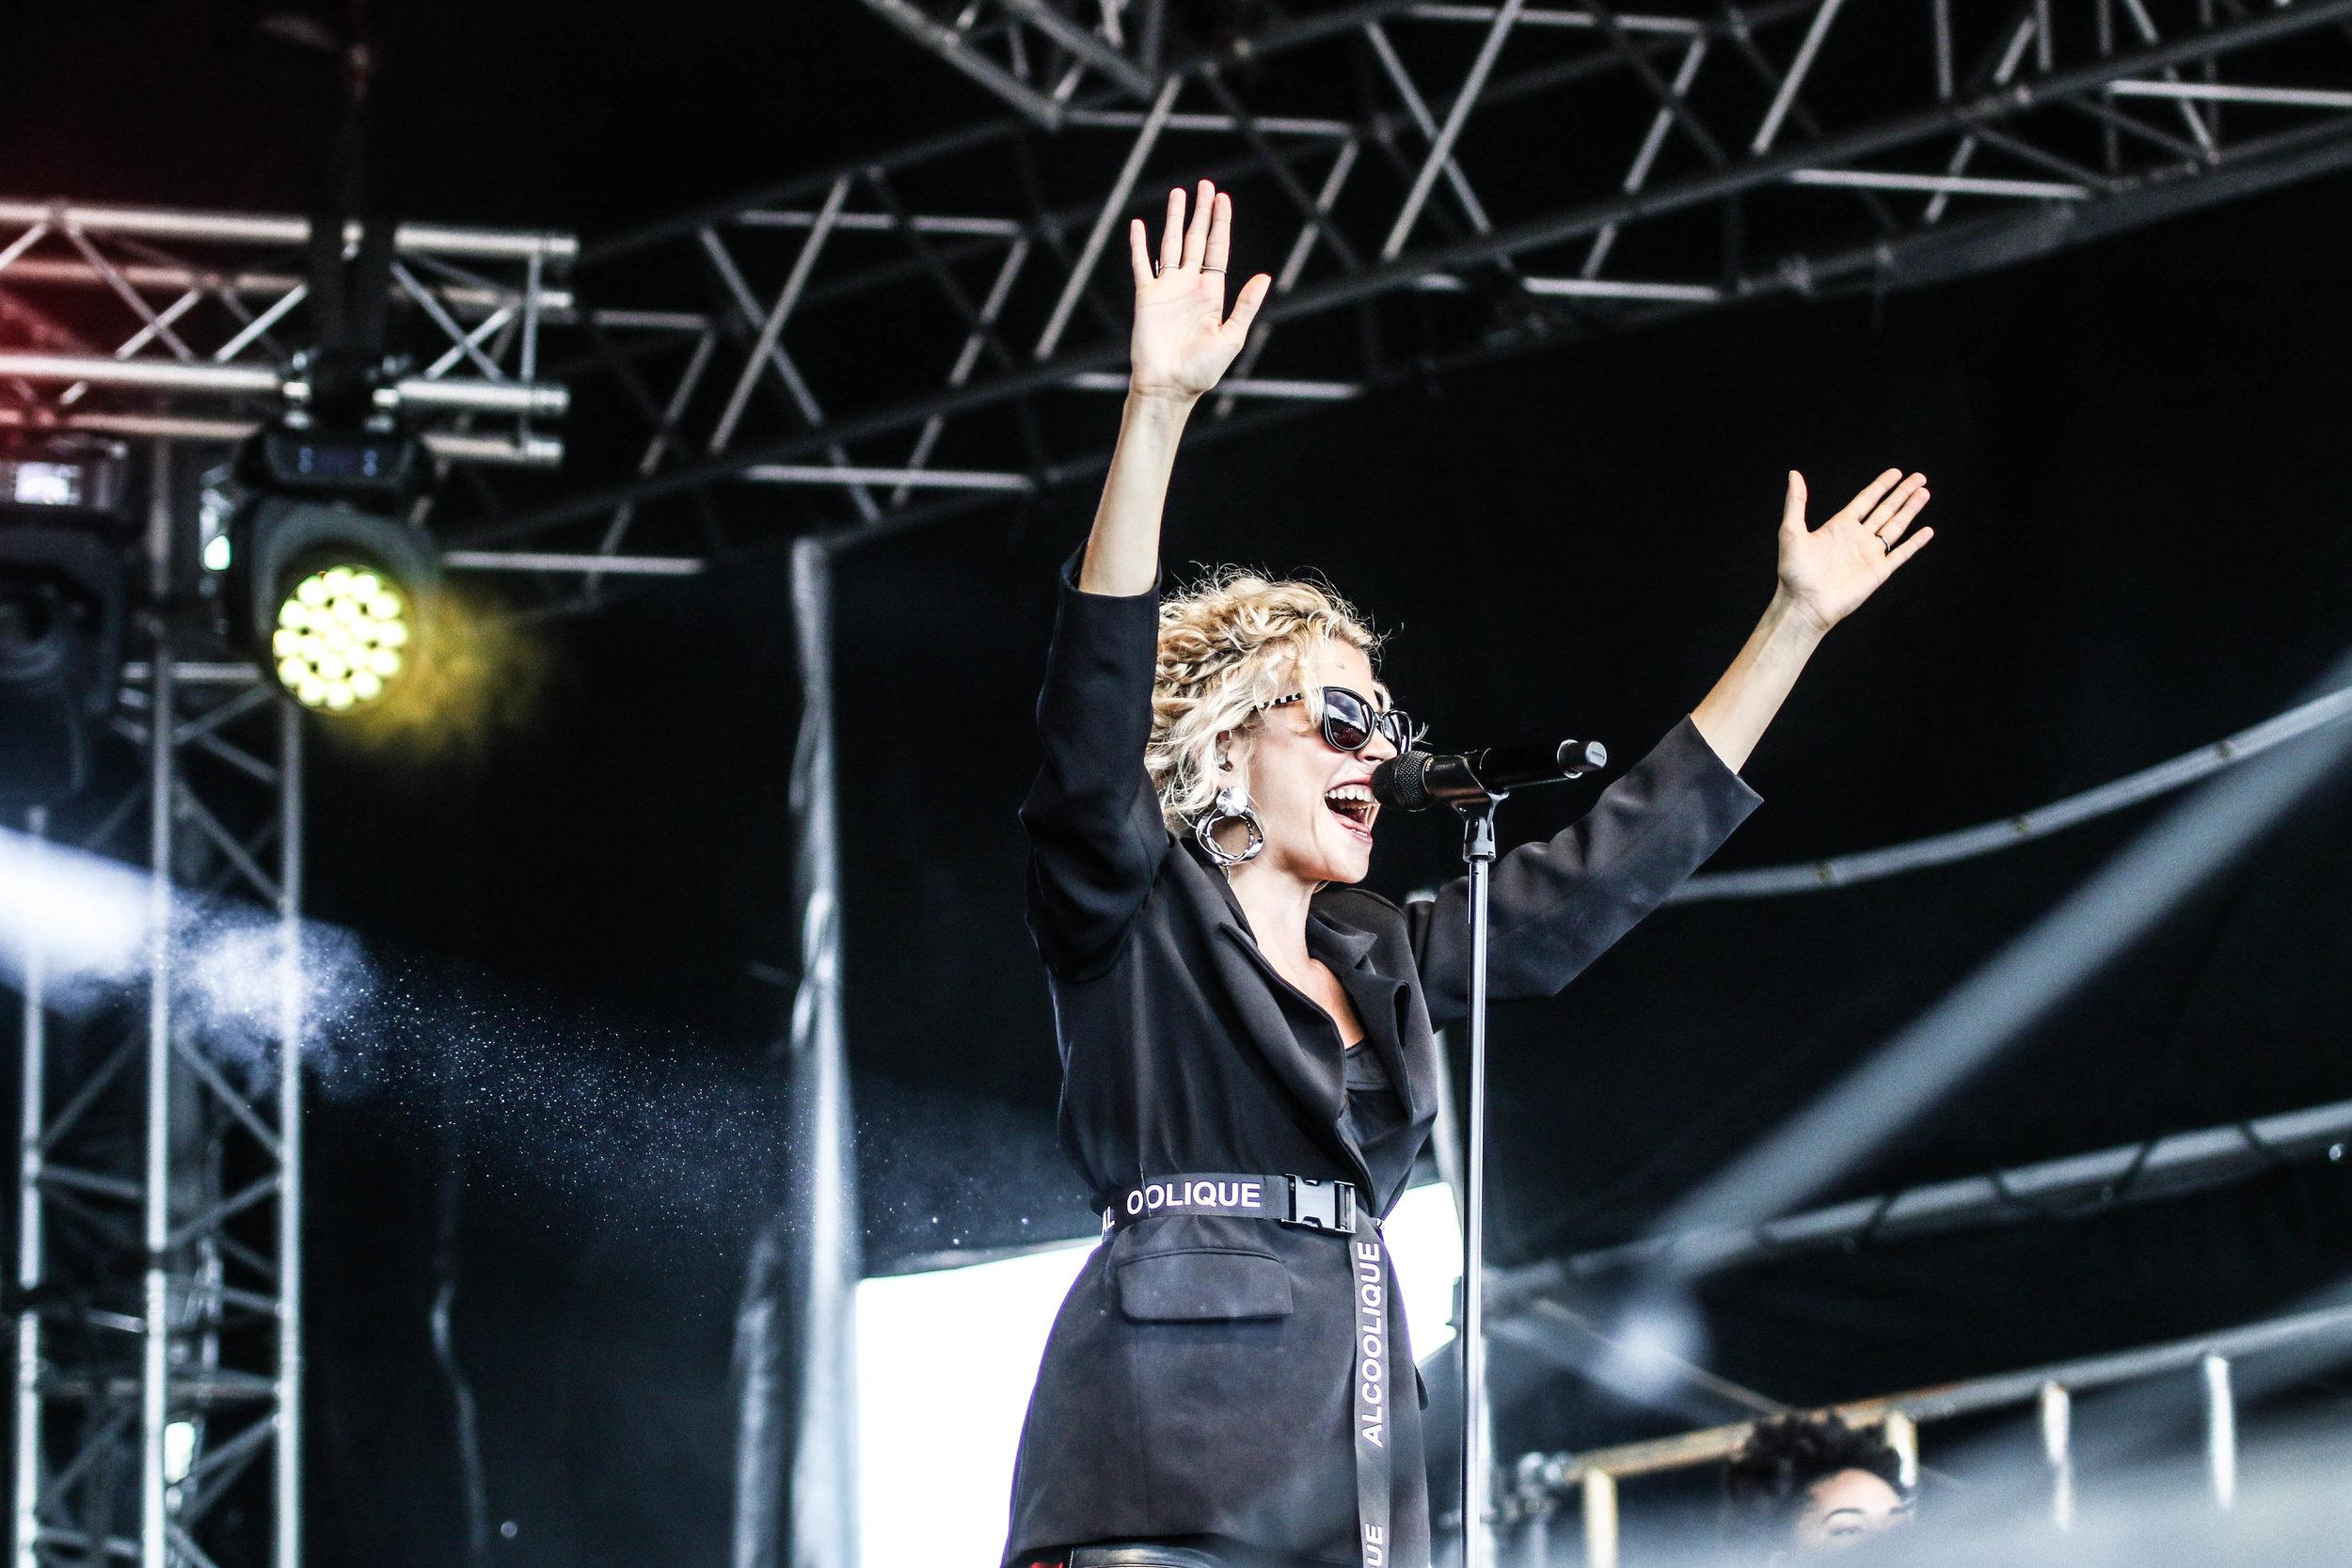 Pixie Lott - Bents Park - 08-07-18 - South Tyneside Festival-4.jpg